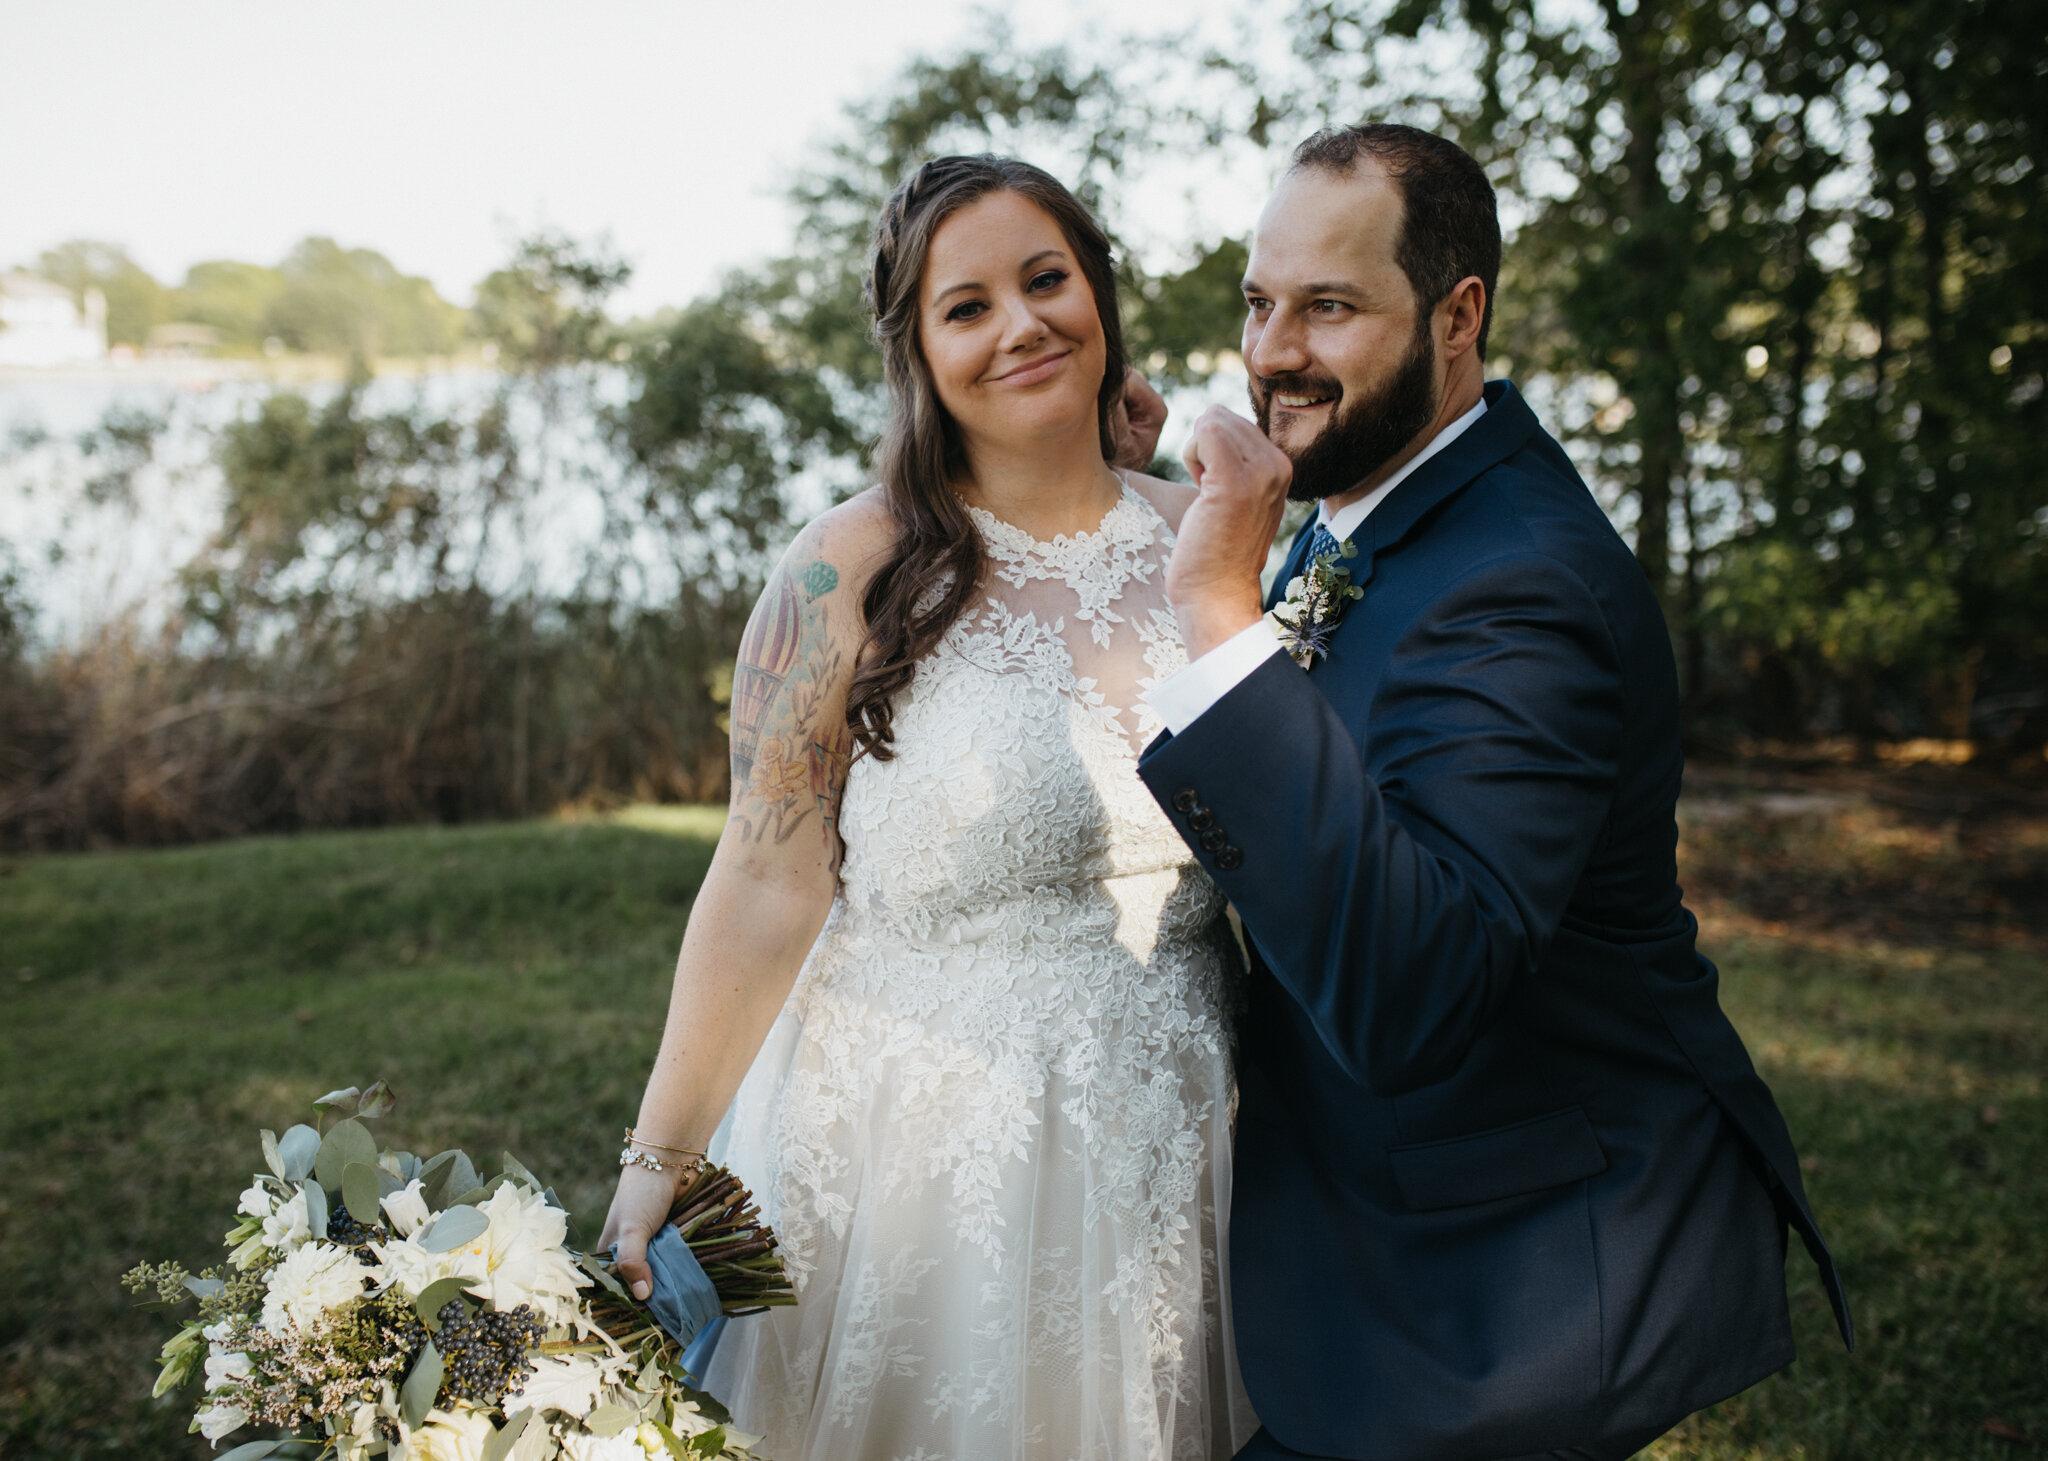 angela_jason_norfolk_wedding-59.jpg